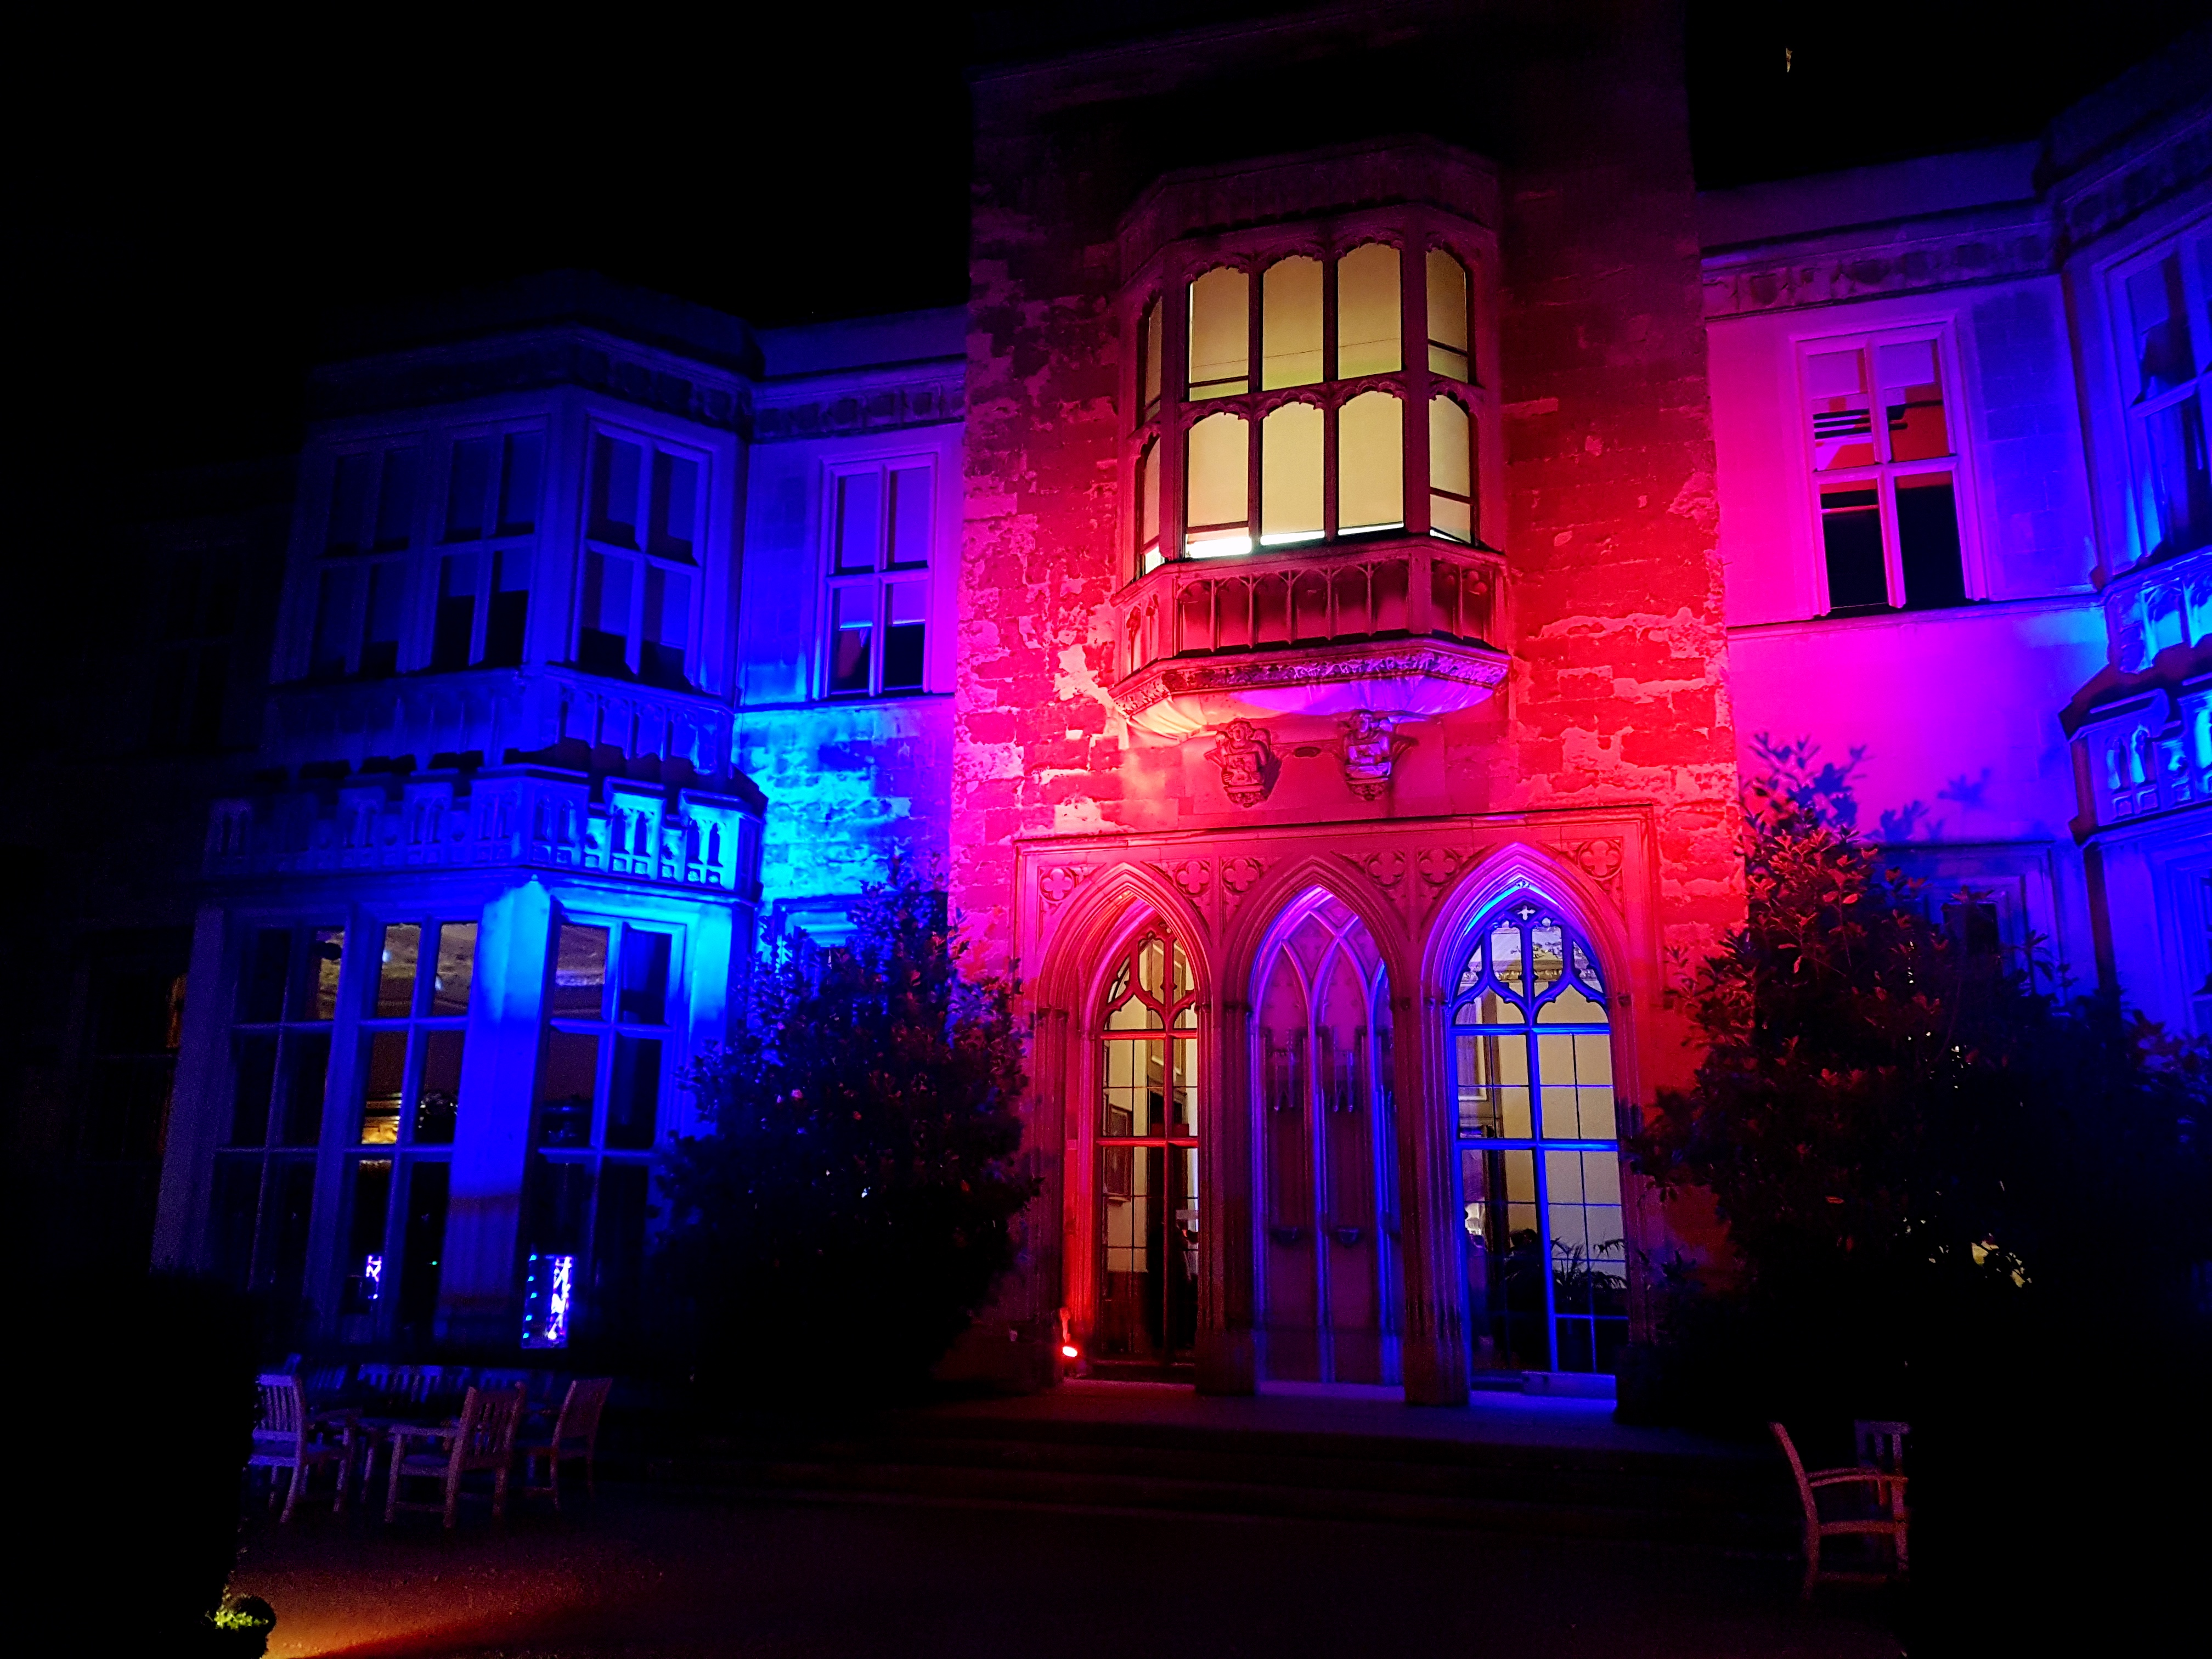 ASHRIDGE HOUSE HERTS